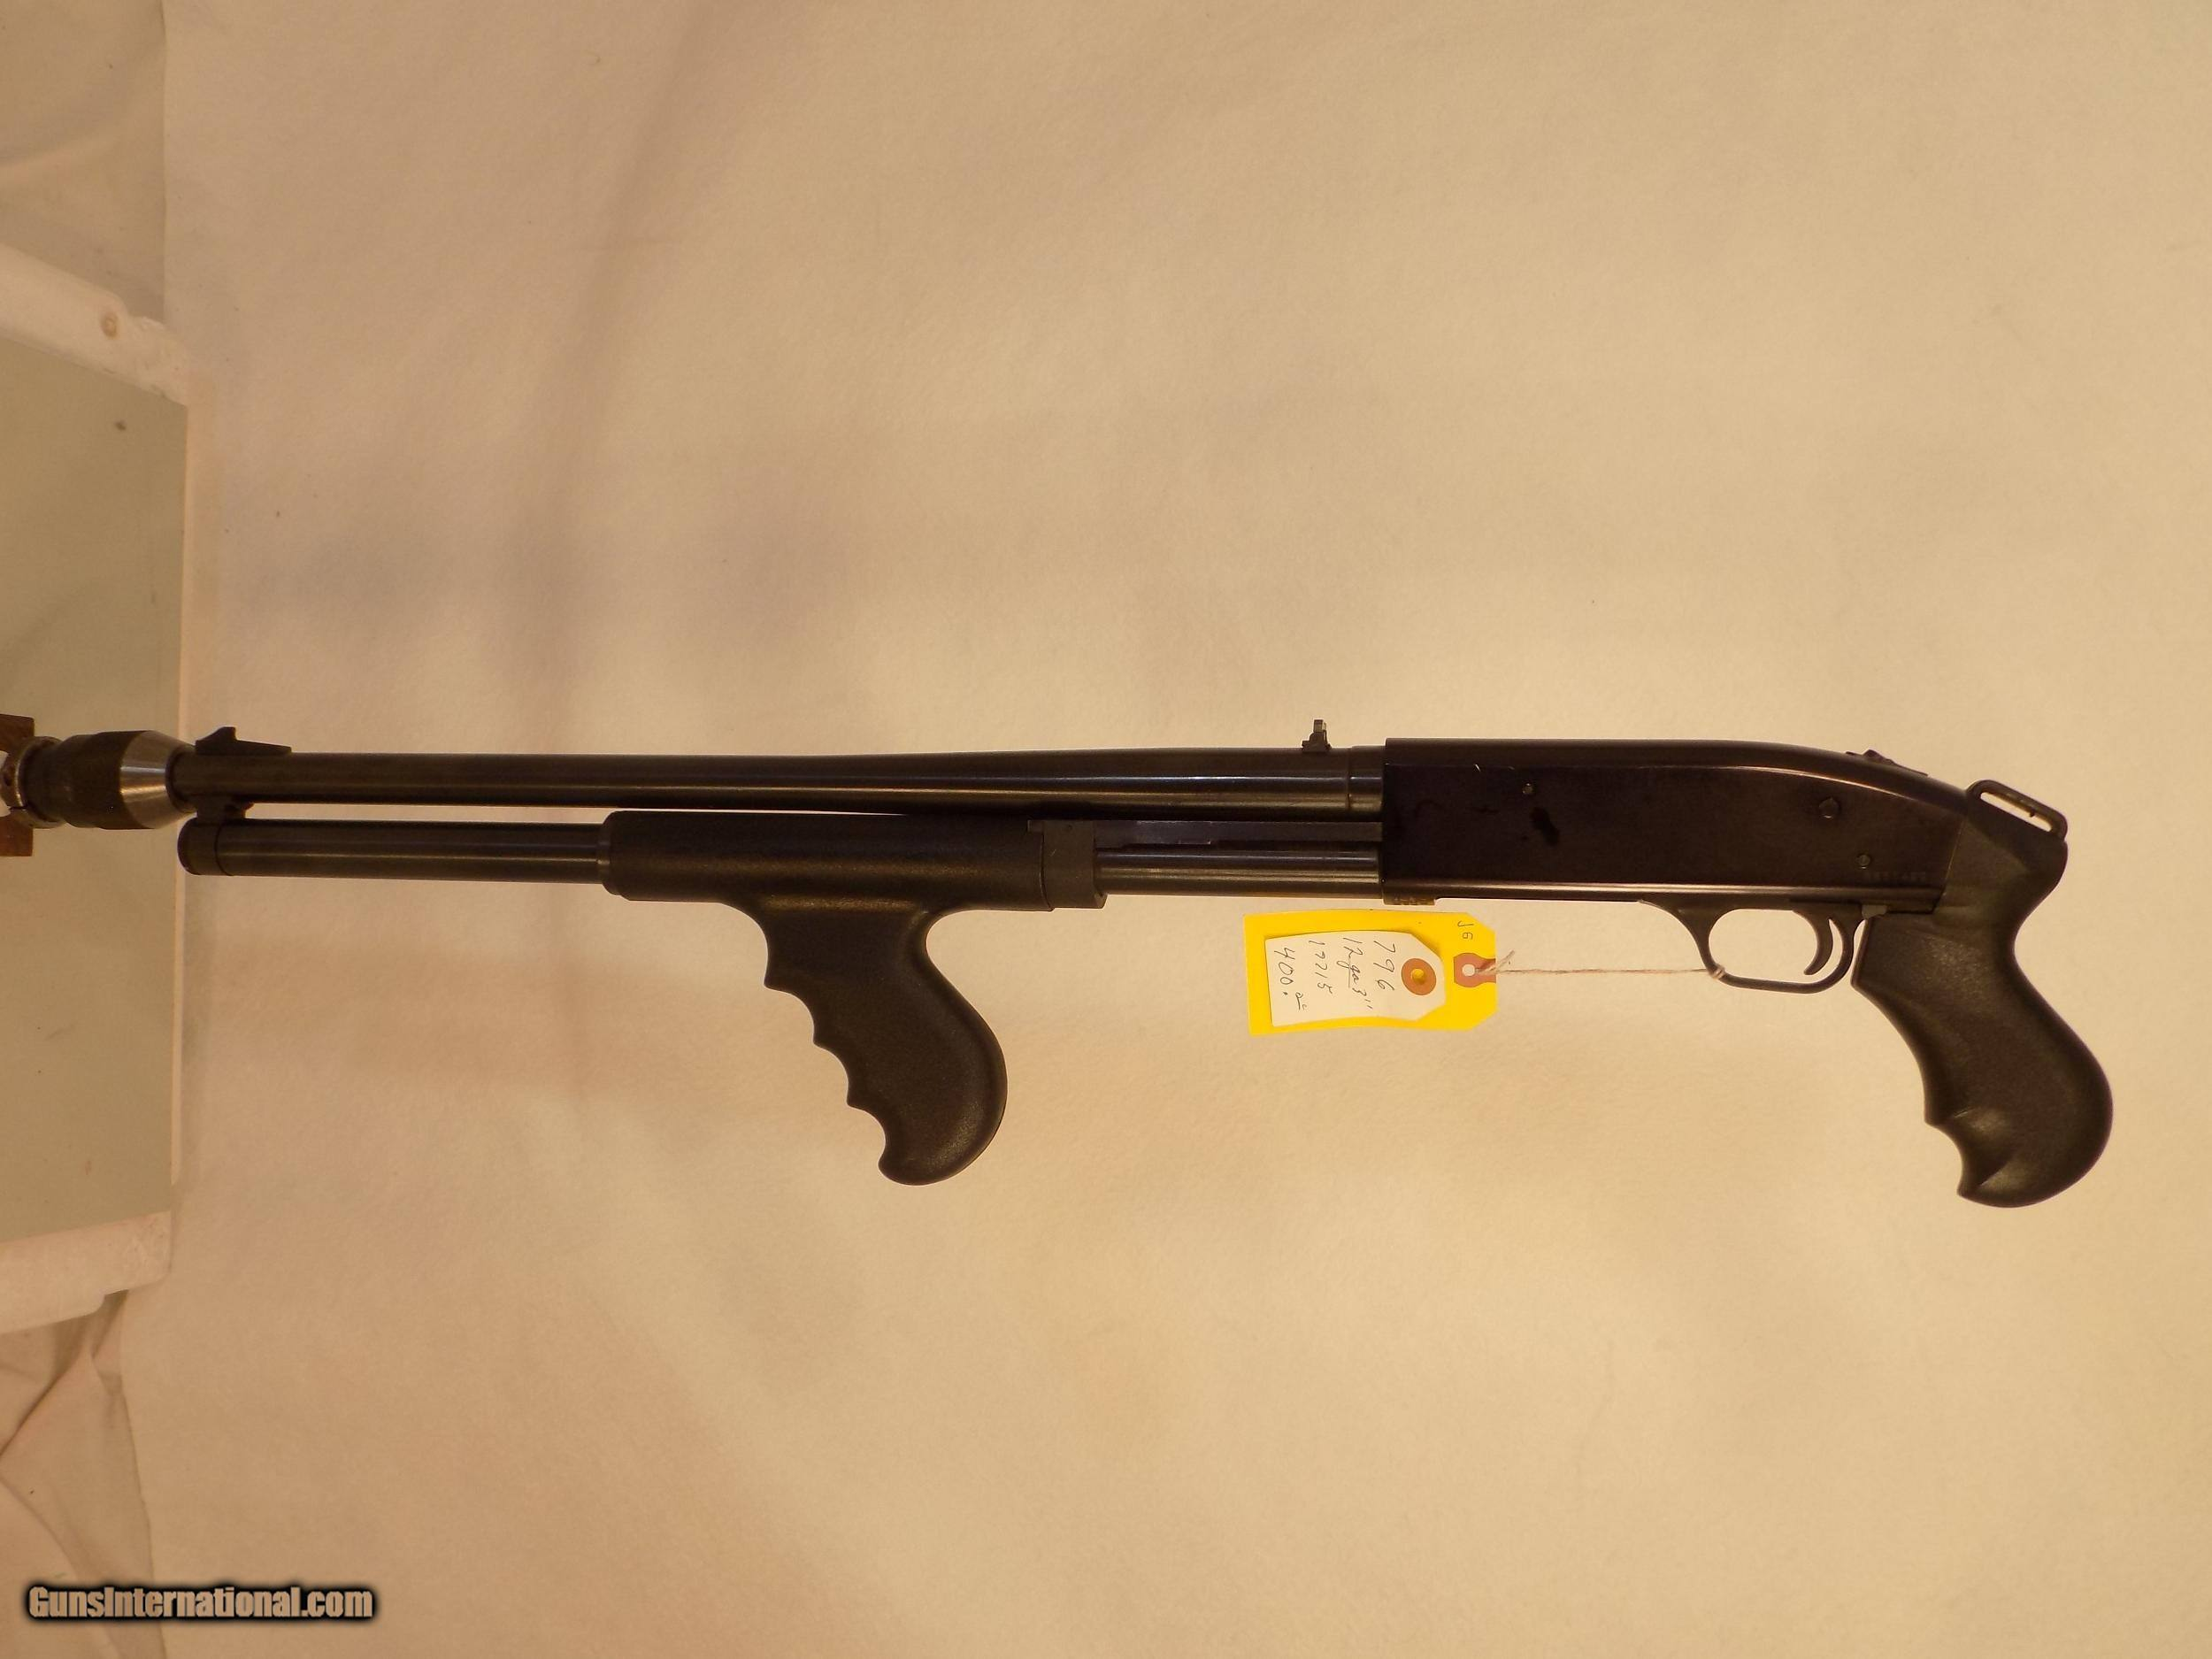 Mossberg Model 500AT Police Gun for sale